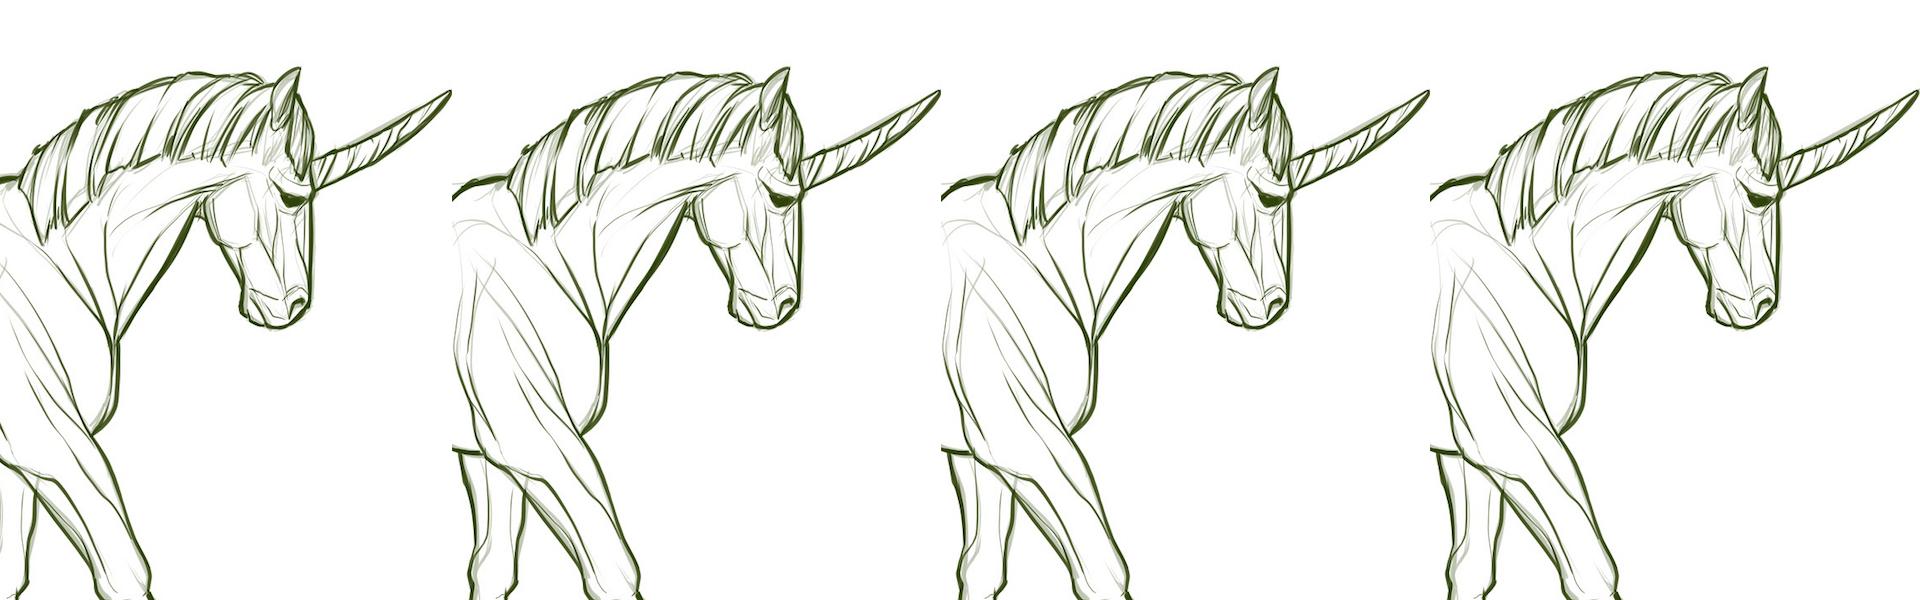 Old unicorn drawings